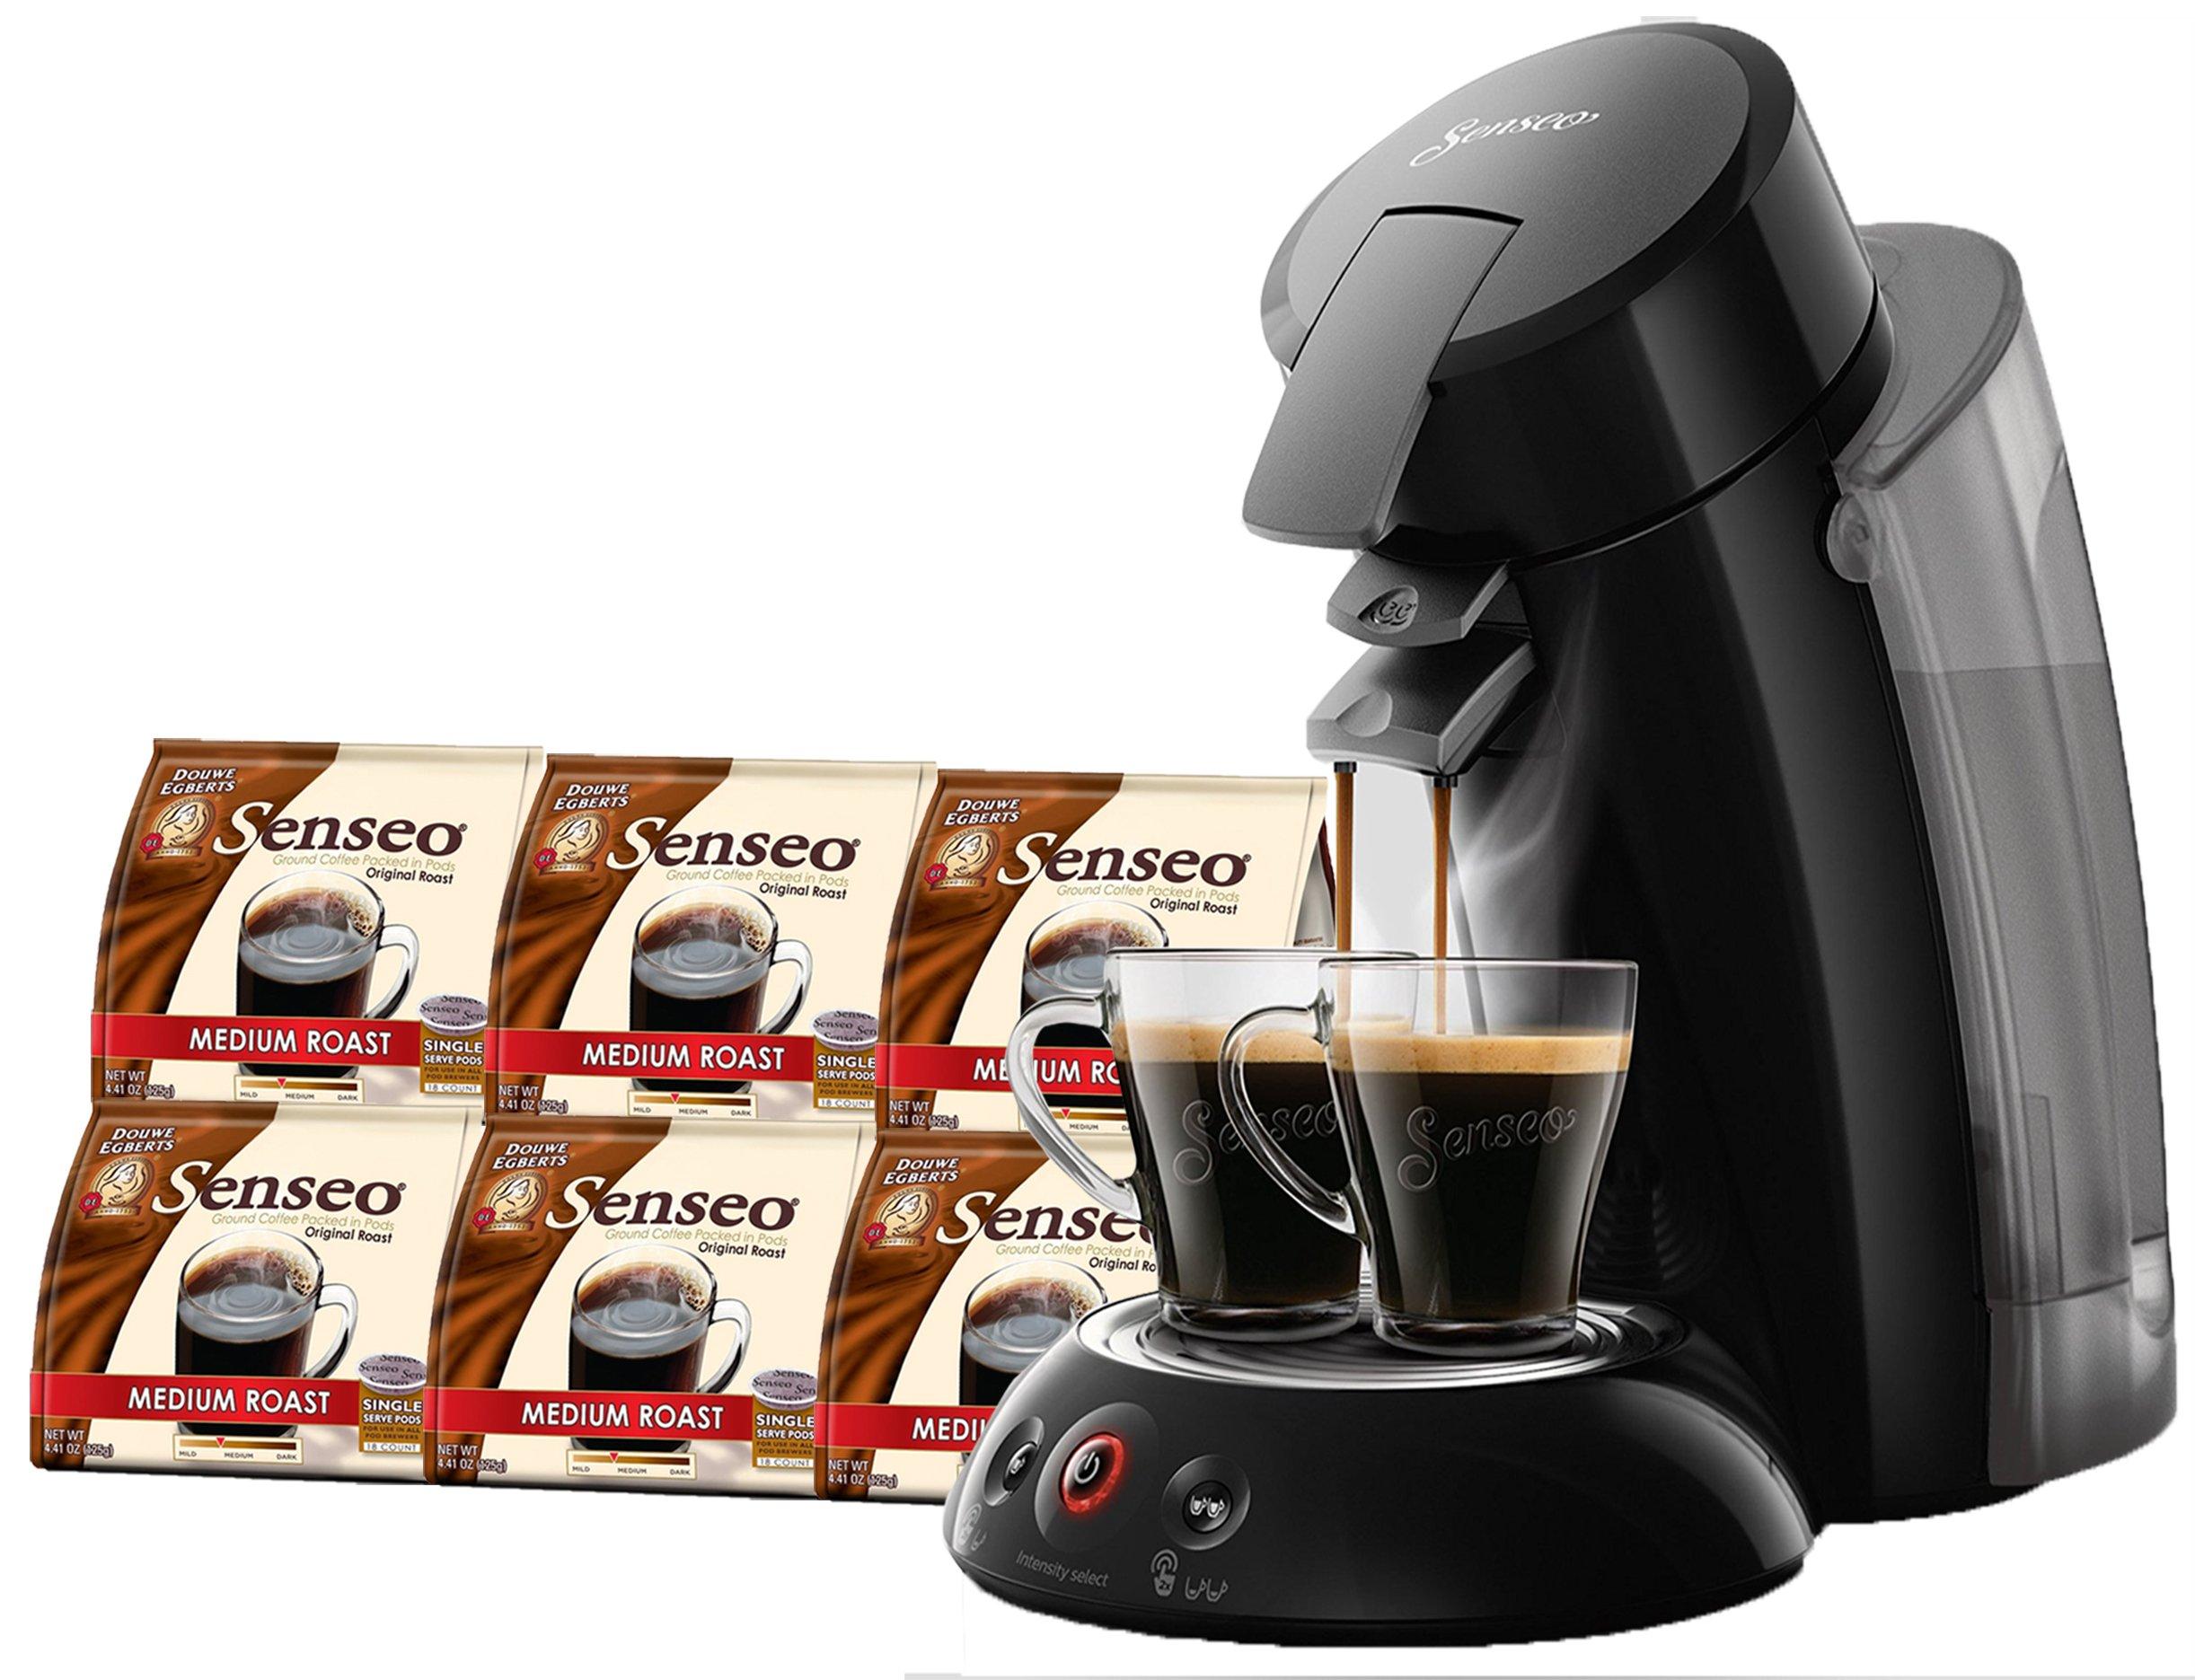 SENSEO Original XL Coffee Pod Machine, Coffee Maker, Coffee Machine, Espresso Machine for Senseo Coffee Pods, 2018 Edition, Black by Senseo